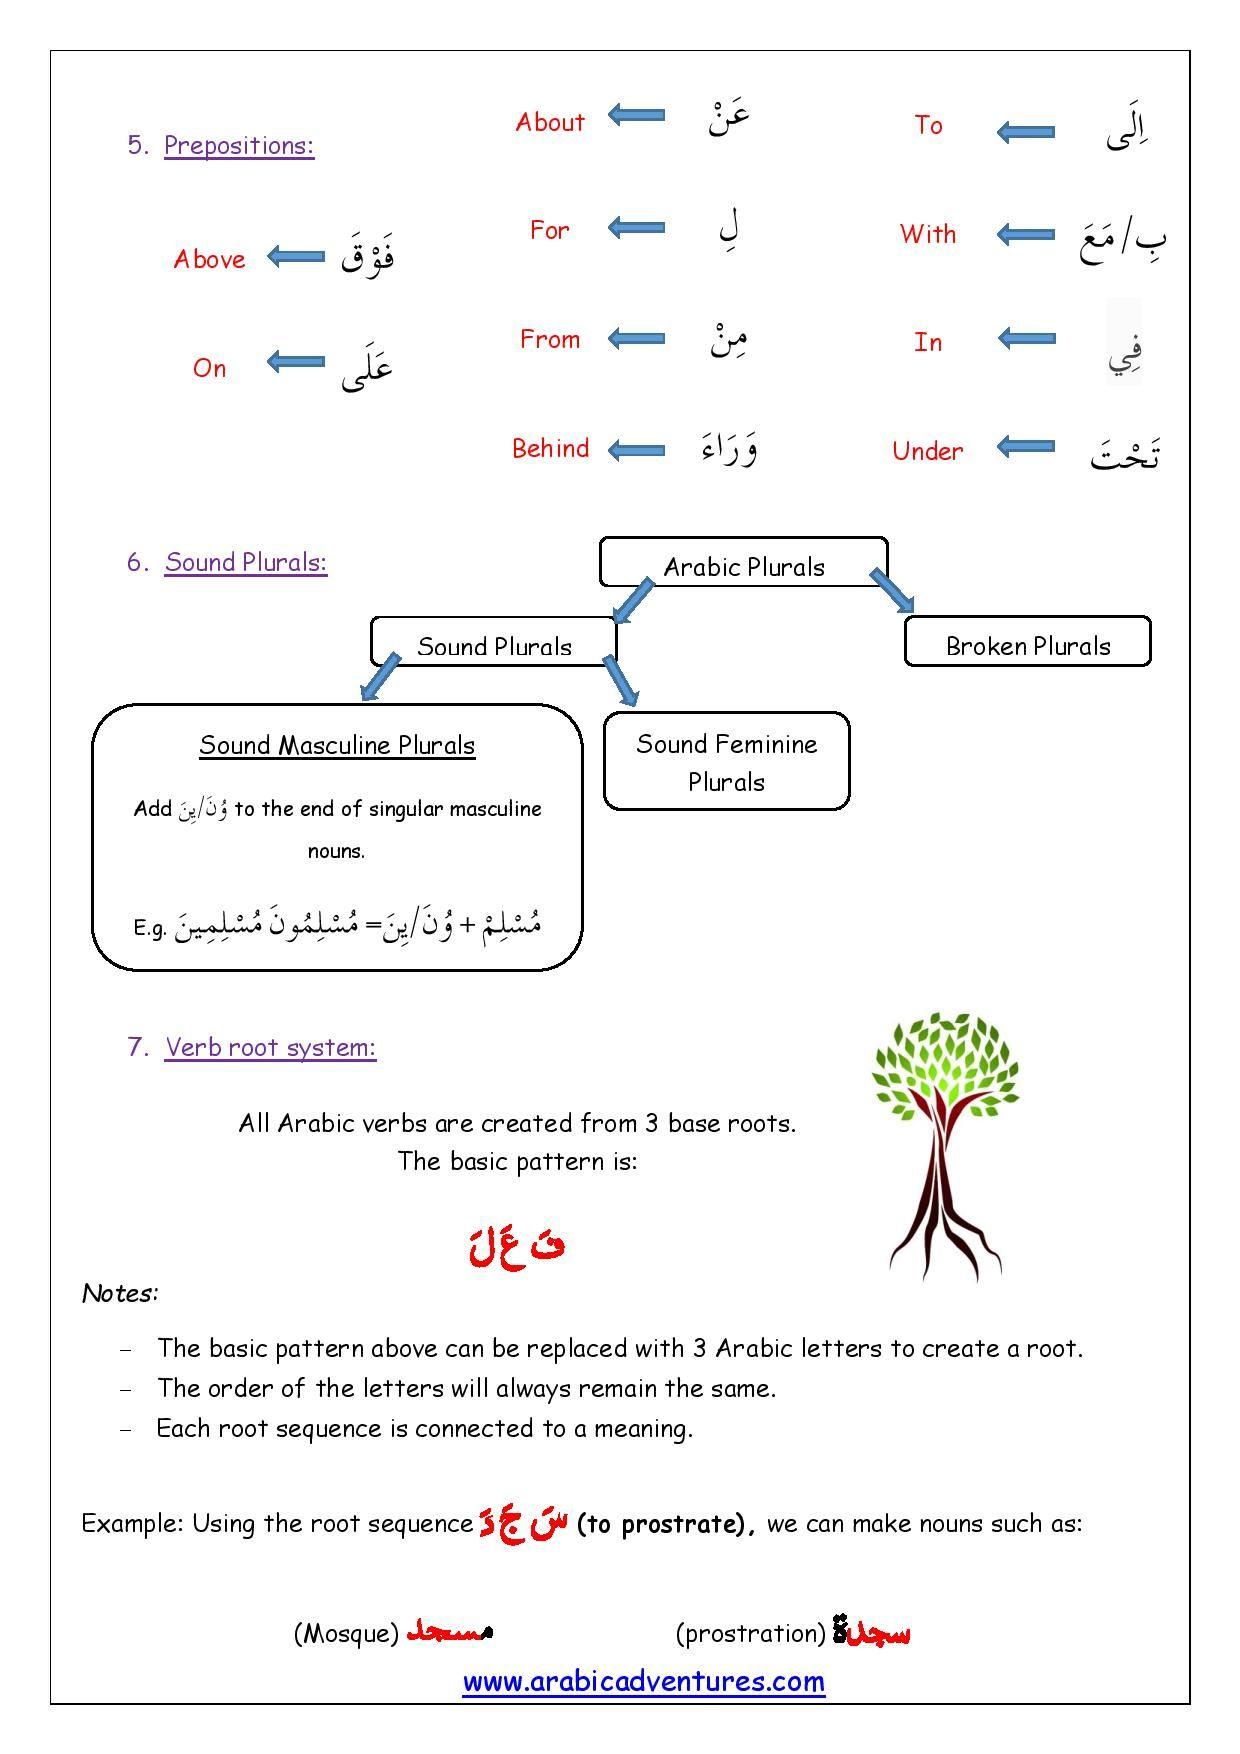 Arabicadventuresdotcom1les Wordpress 08 Back